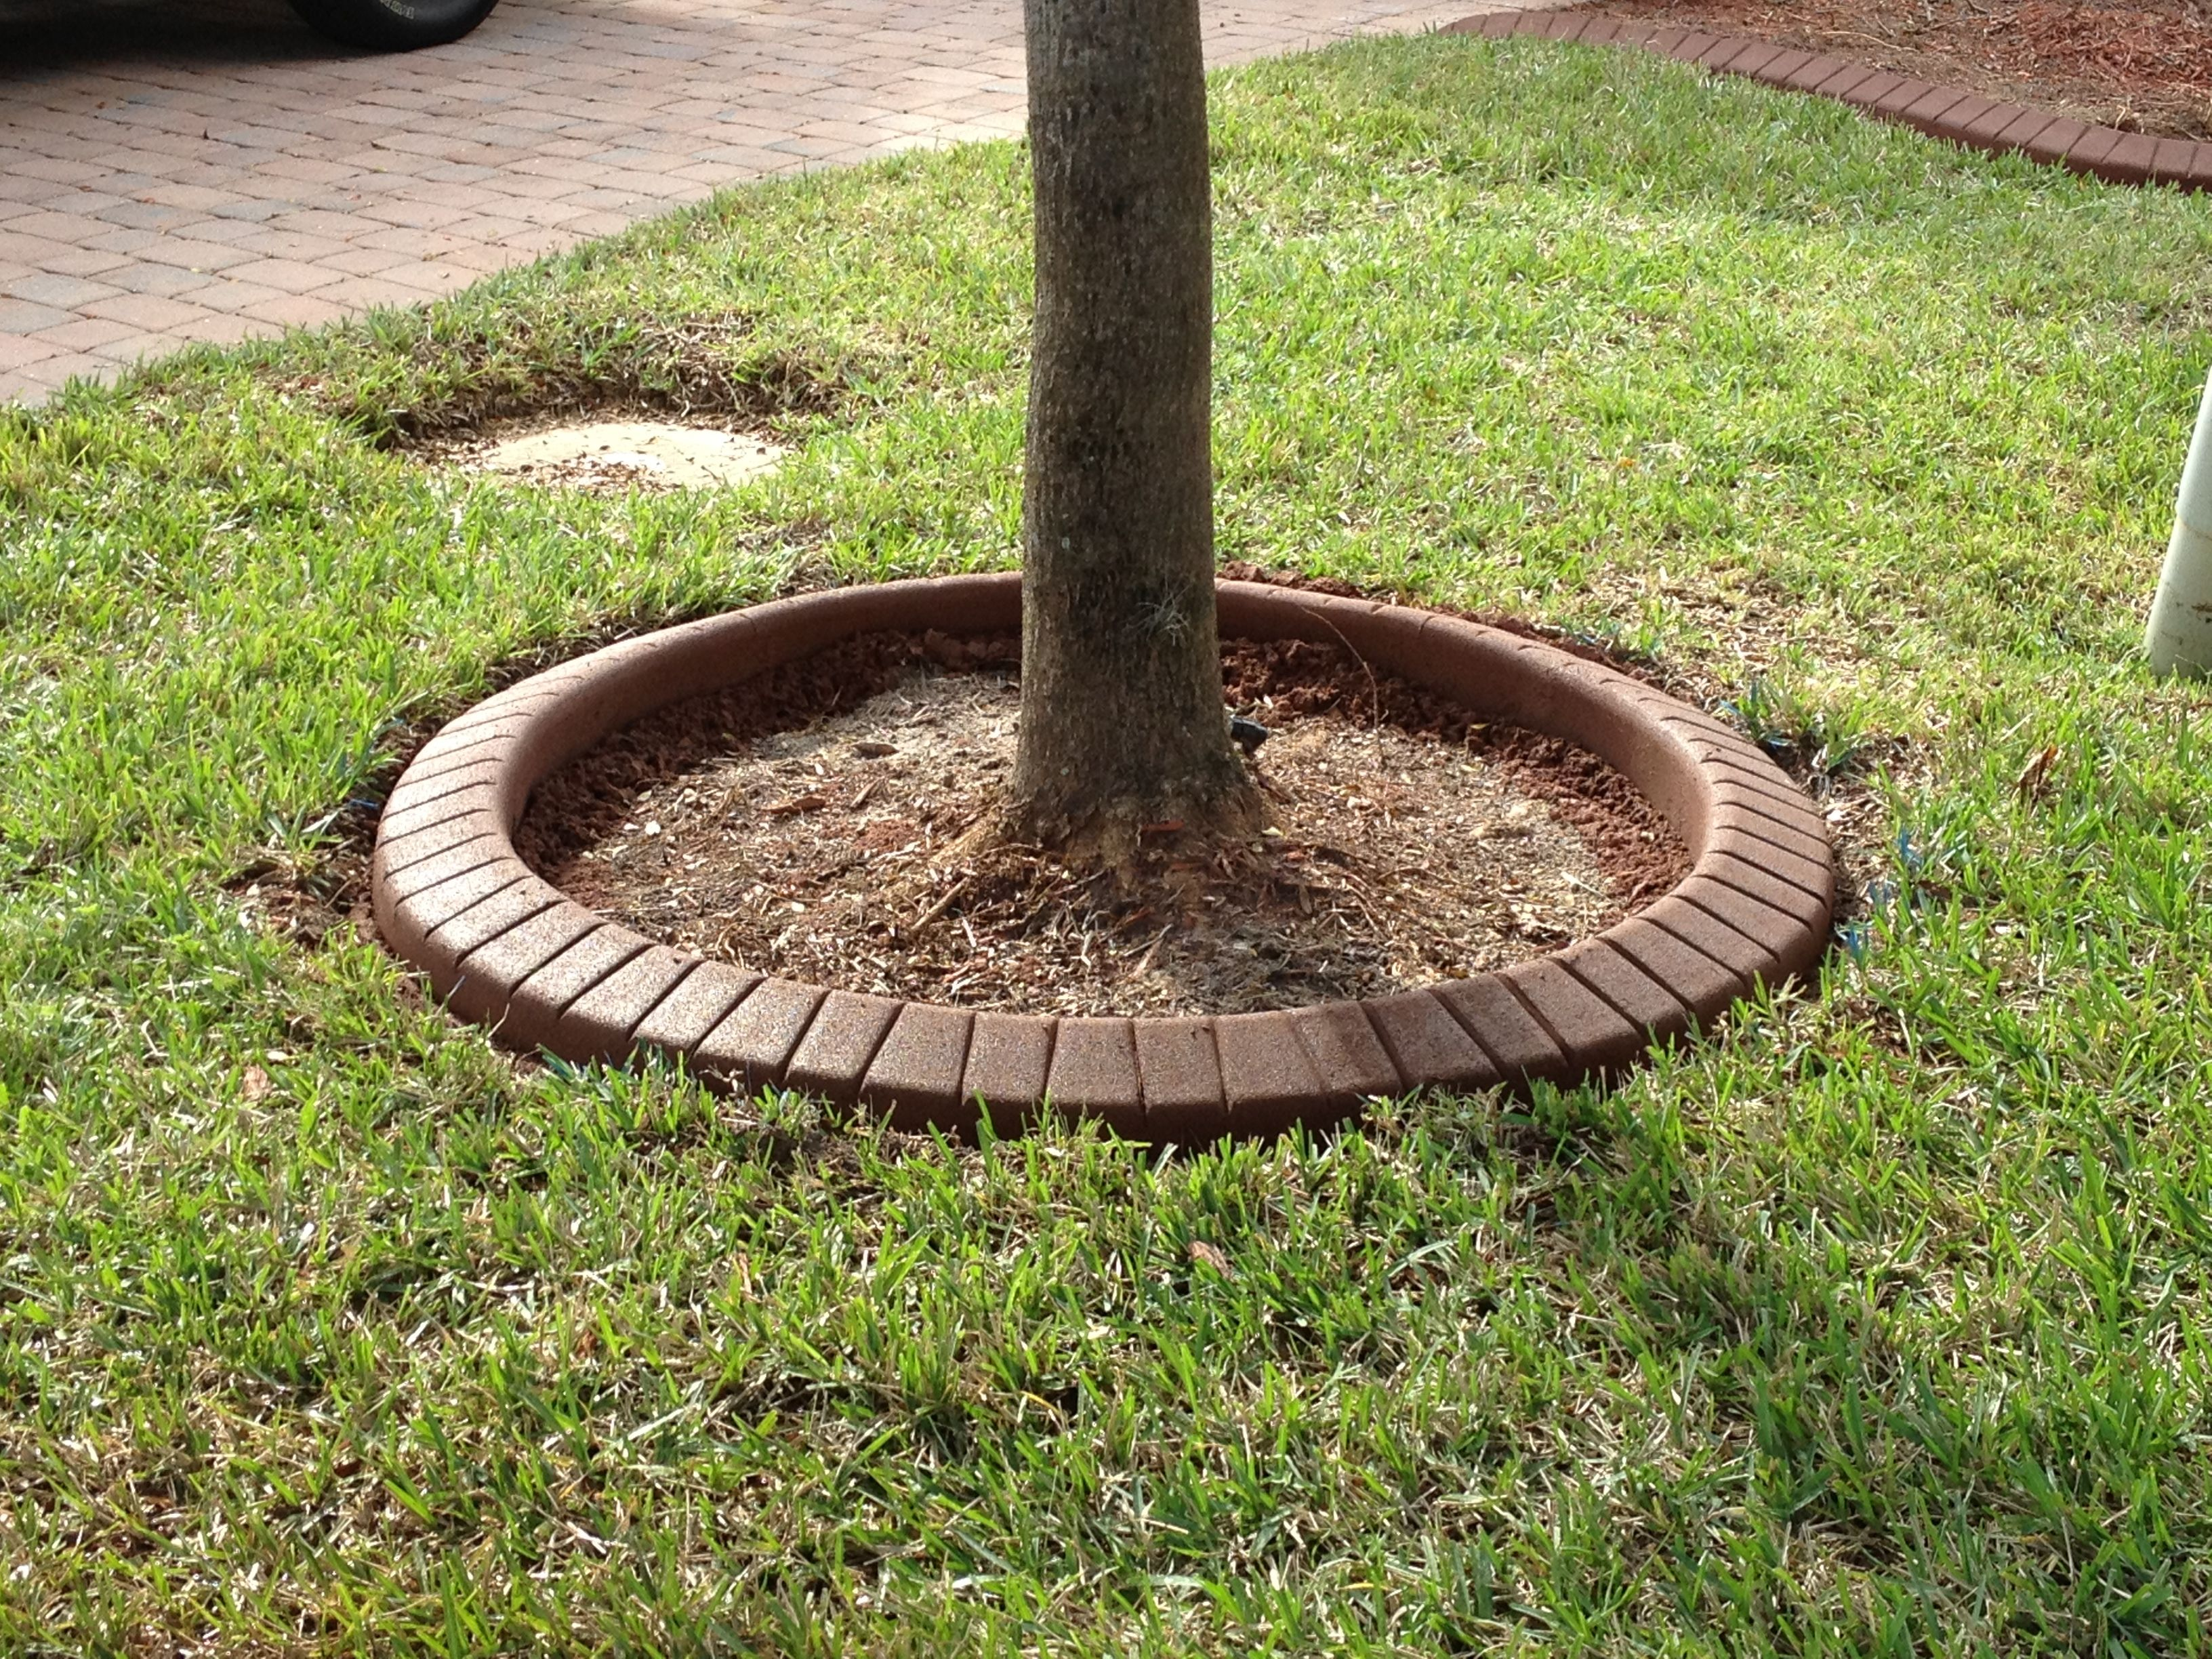 Perfect circle, tree ring. Brick stamp. Landscape